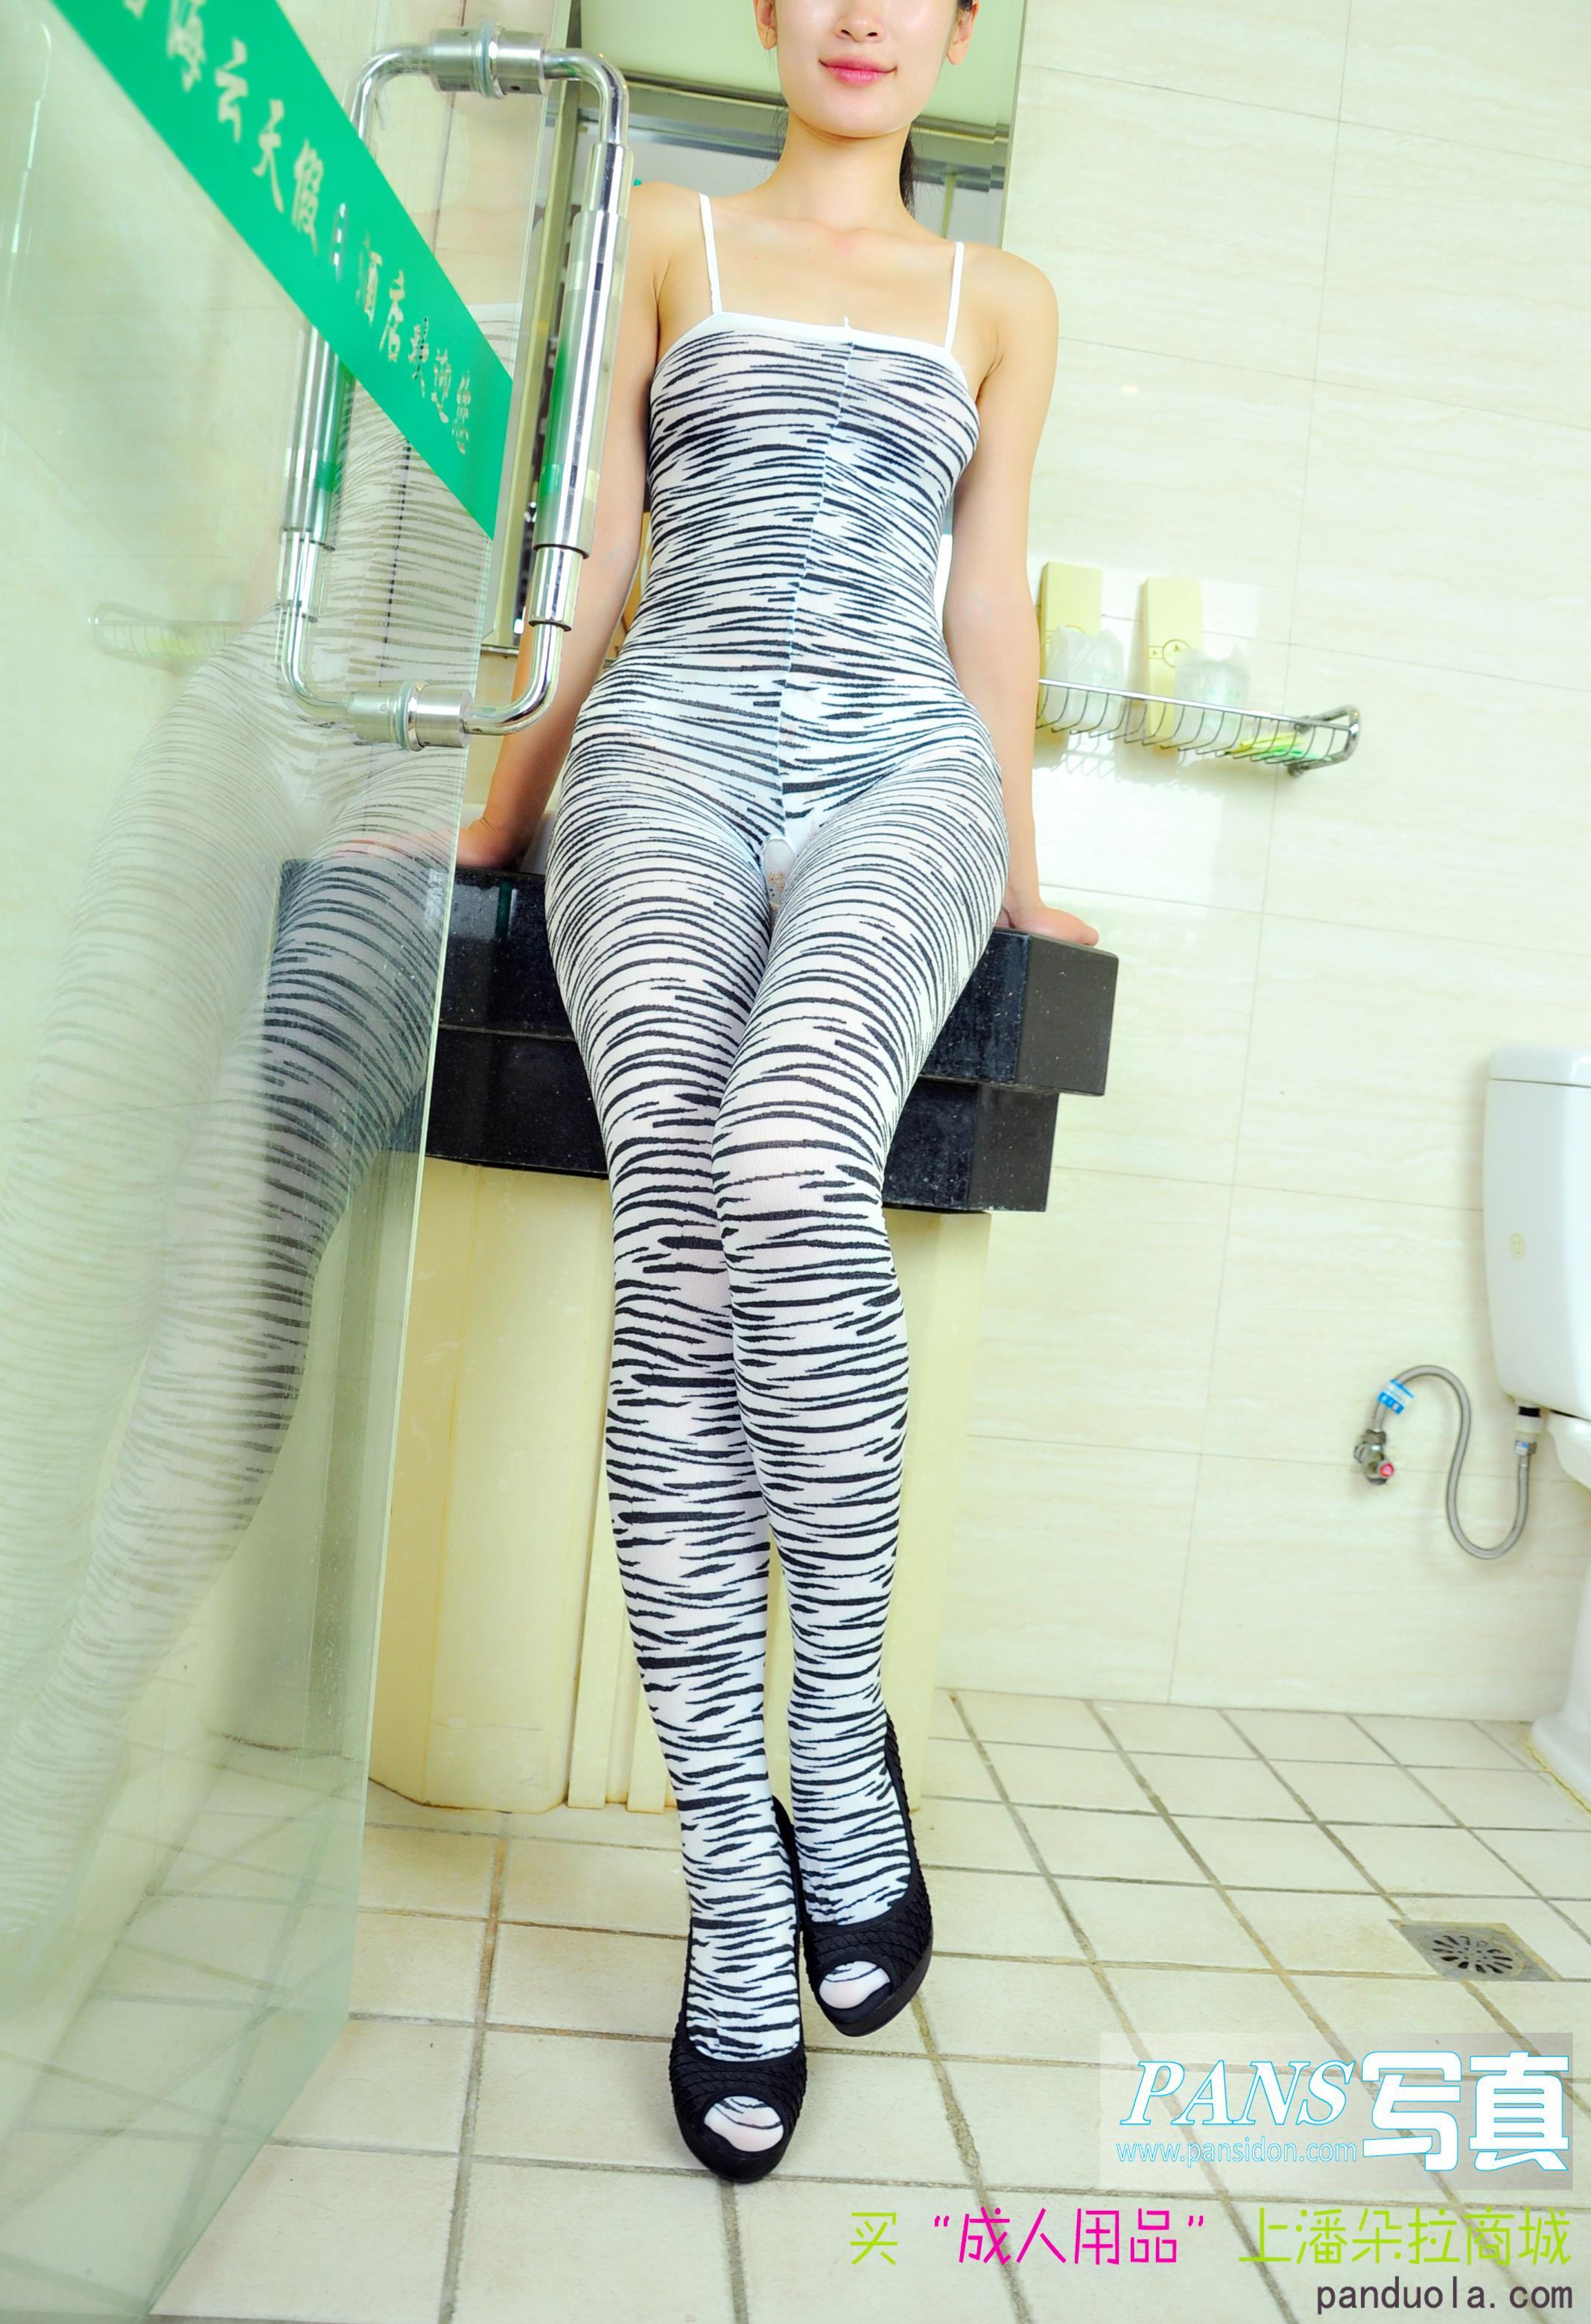 [PANS盘丝洞写真]NO.083期 性感美女吊带连体装私房写真集